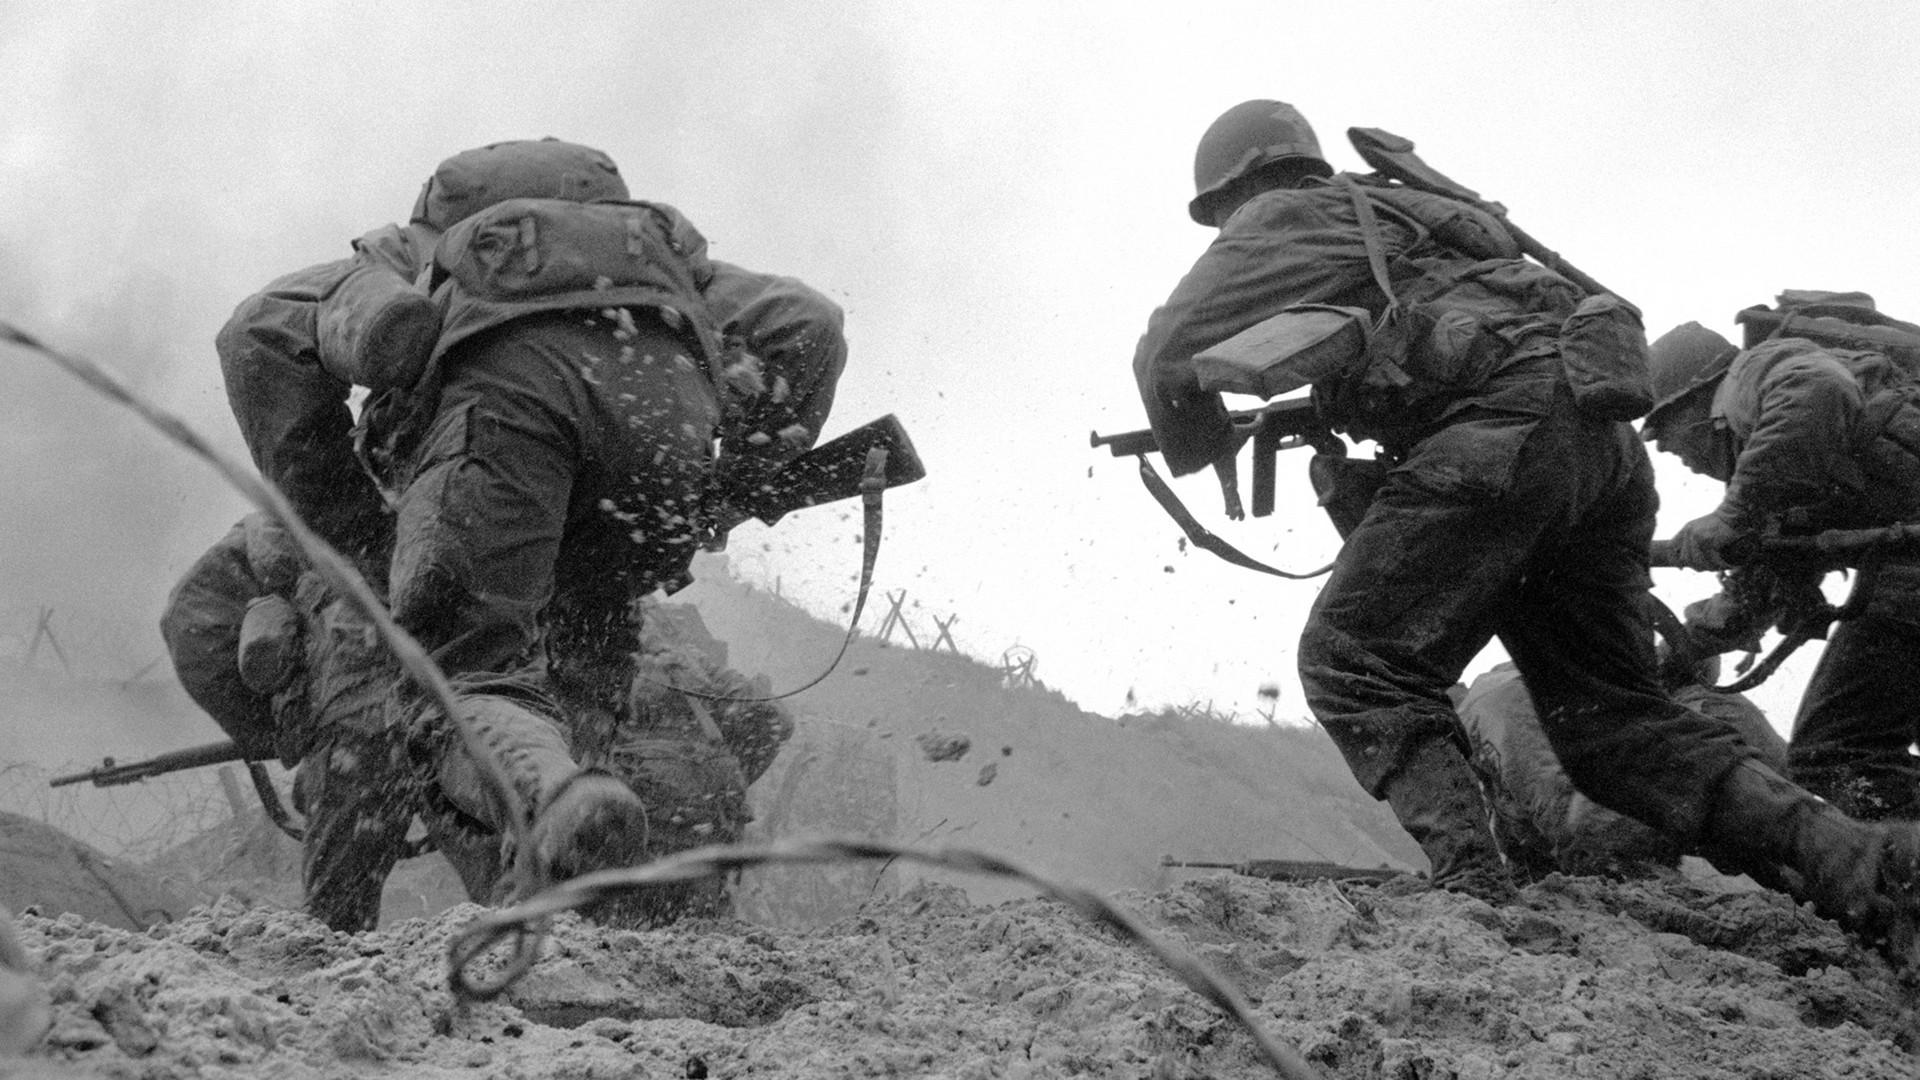 Wallpaper people war beach soldier army marines world war ii marksman omaha beach 1920x1080 px geology black and white monochrome photography